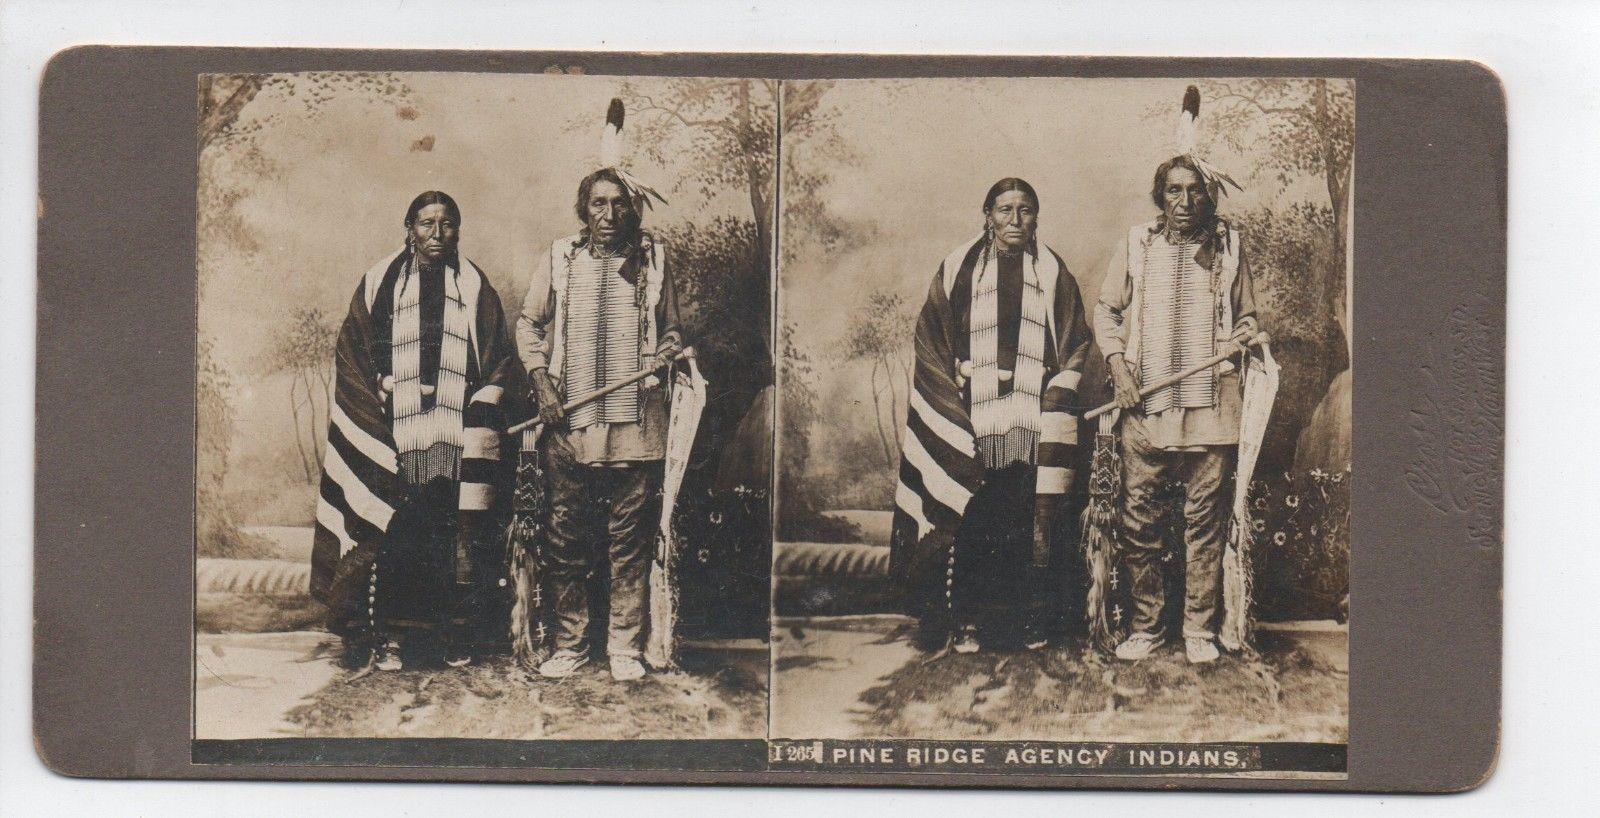 http://www.american-tribes.com/messageboards/dietmar/PineRidgeCross.jpg